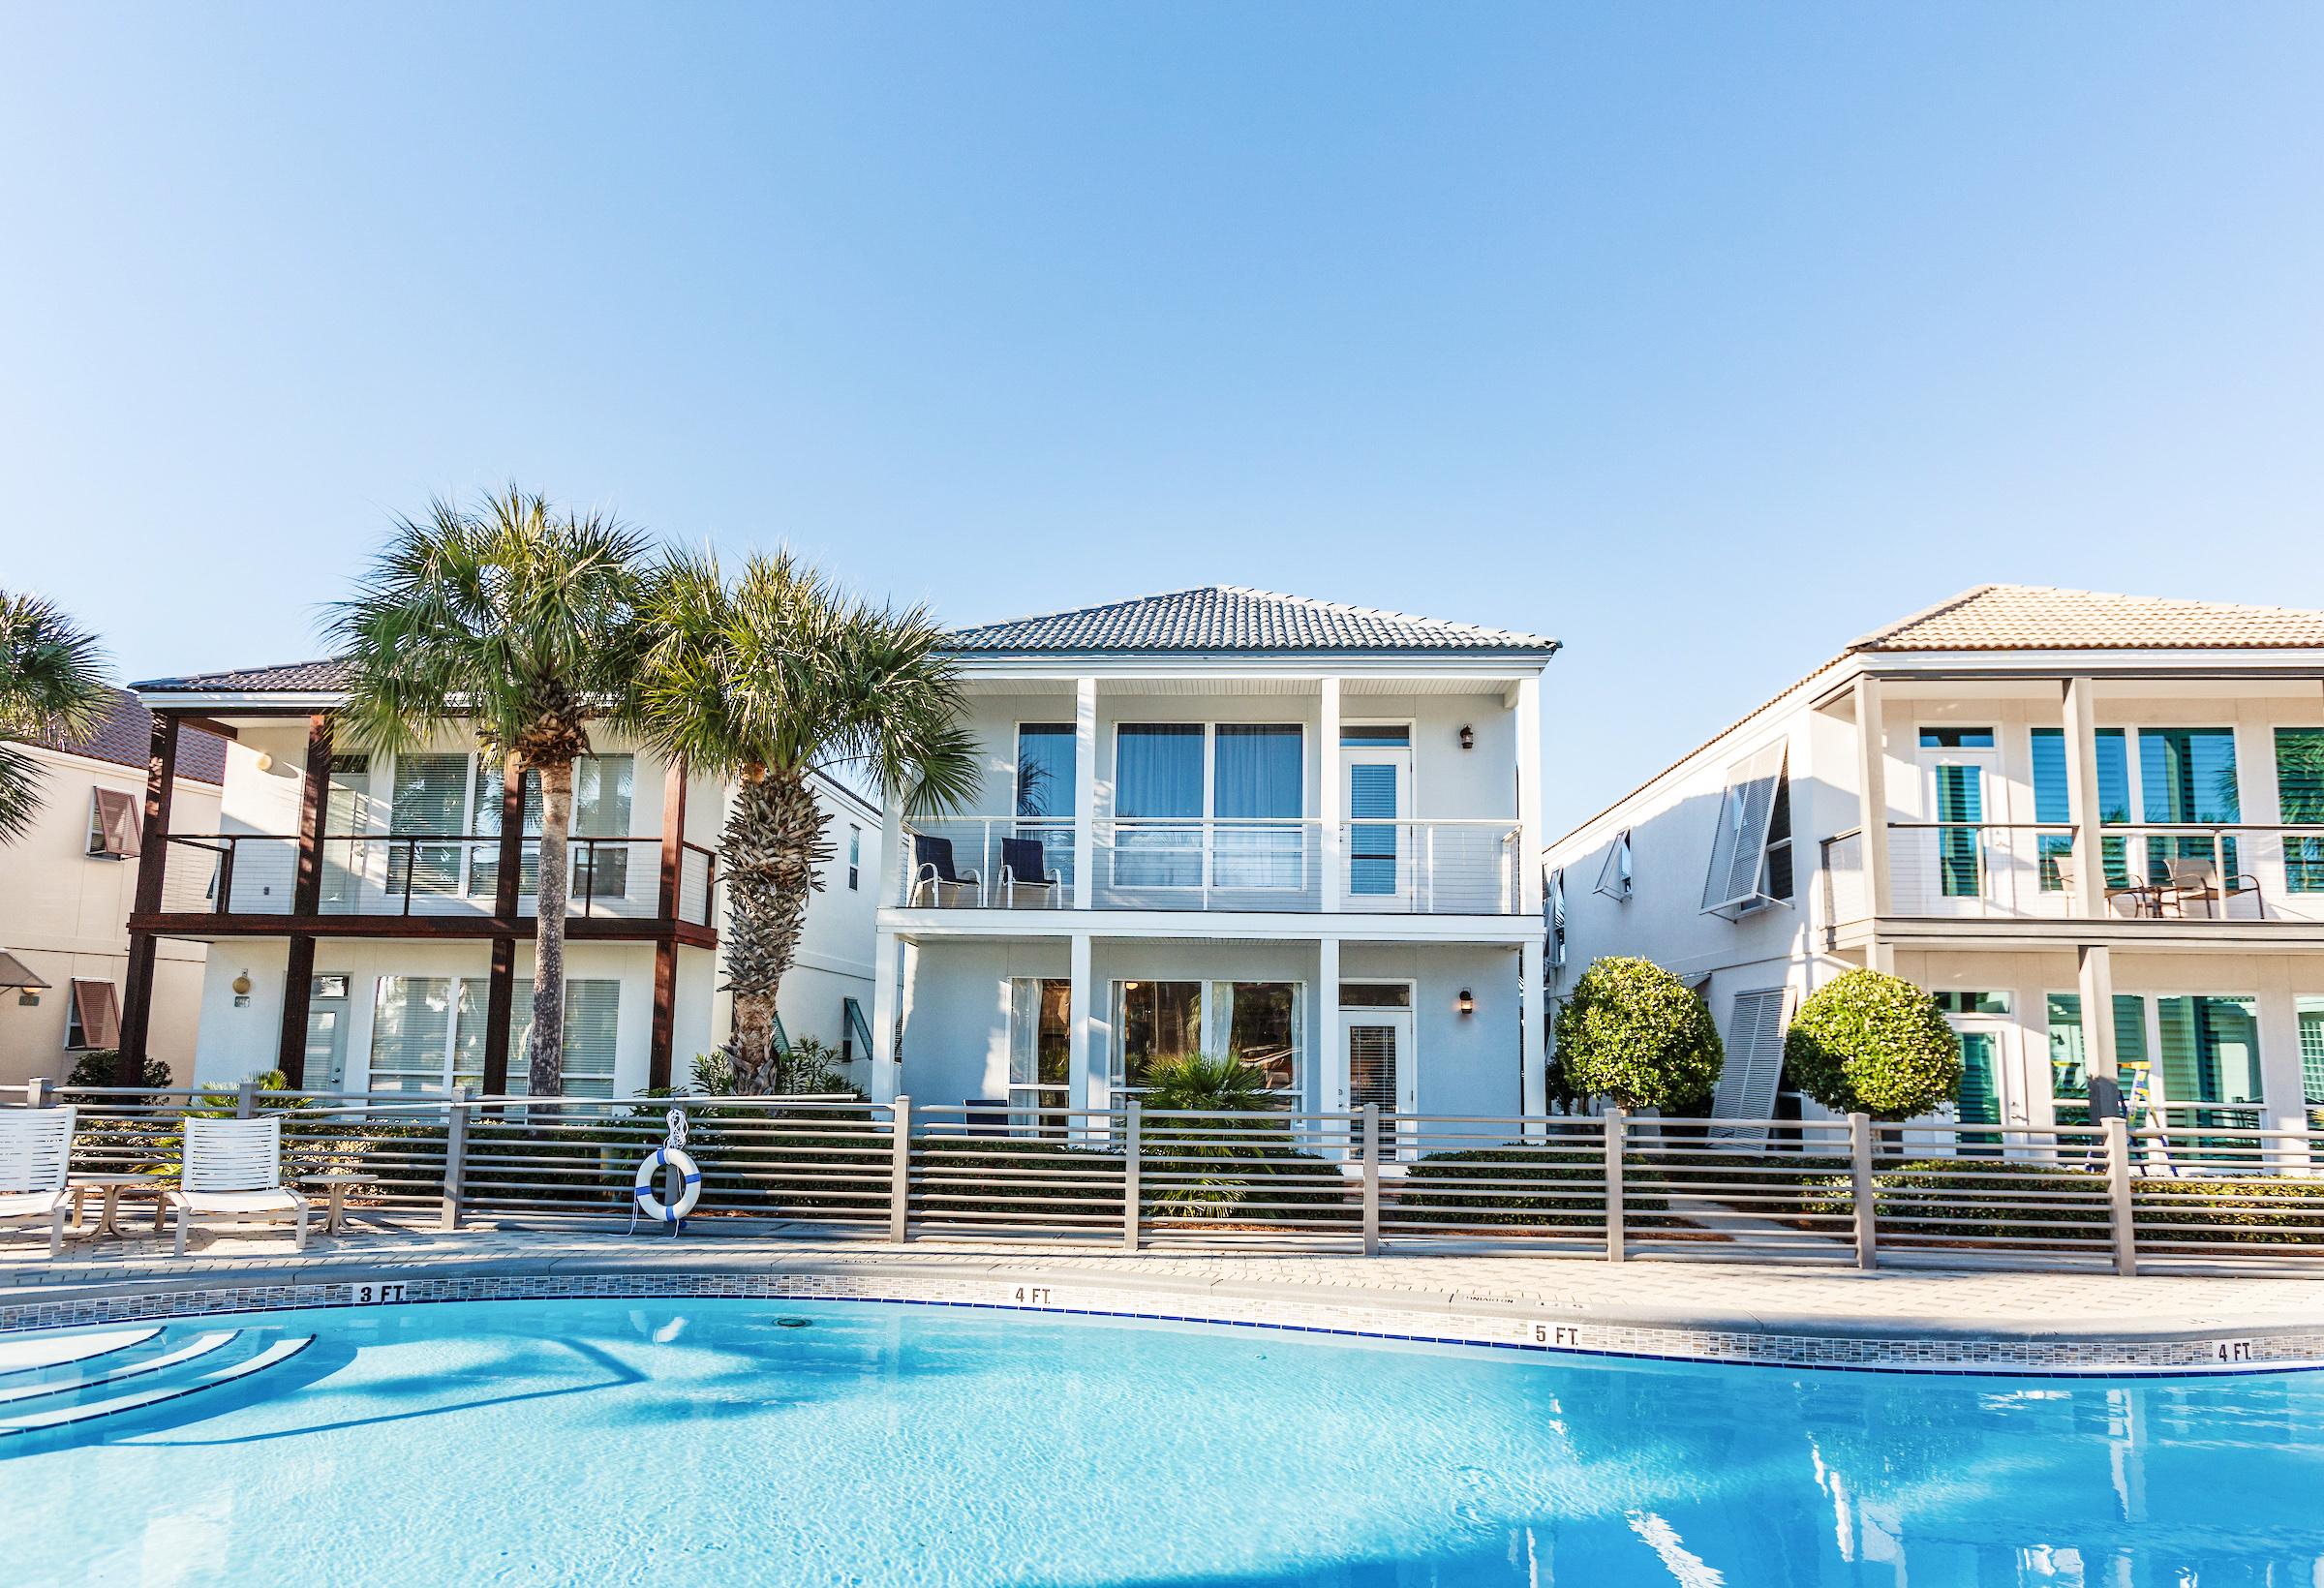 Destin FL Vacation Rental Your top-floor unit